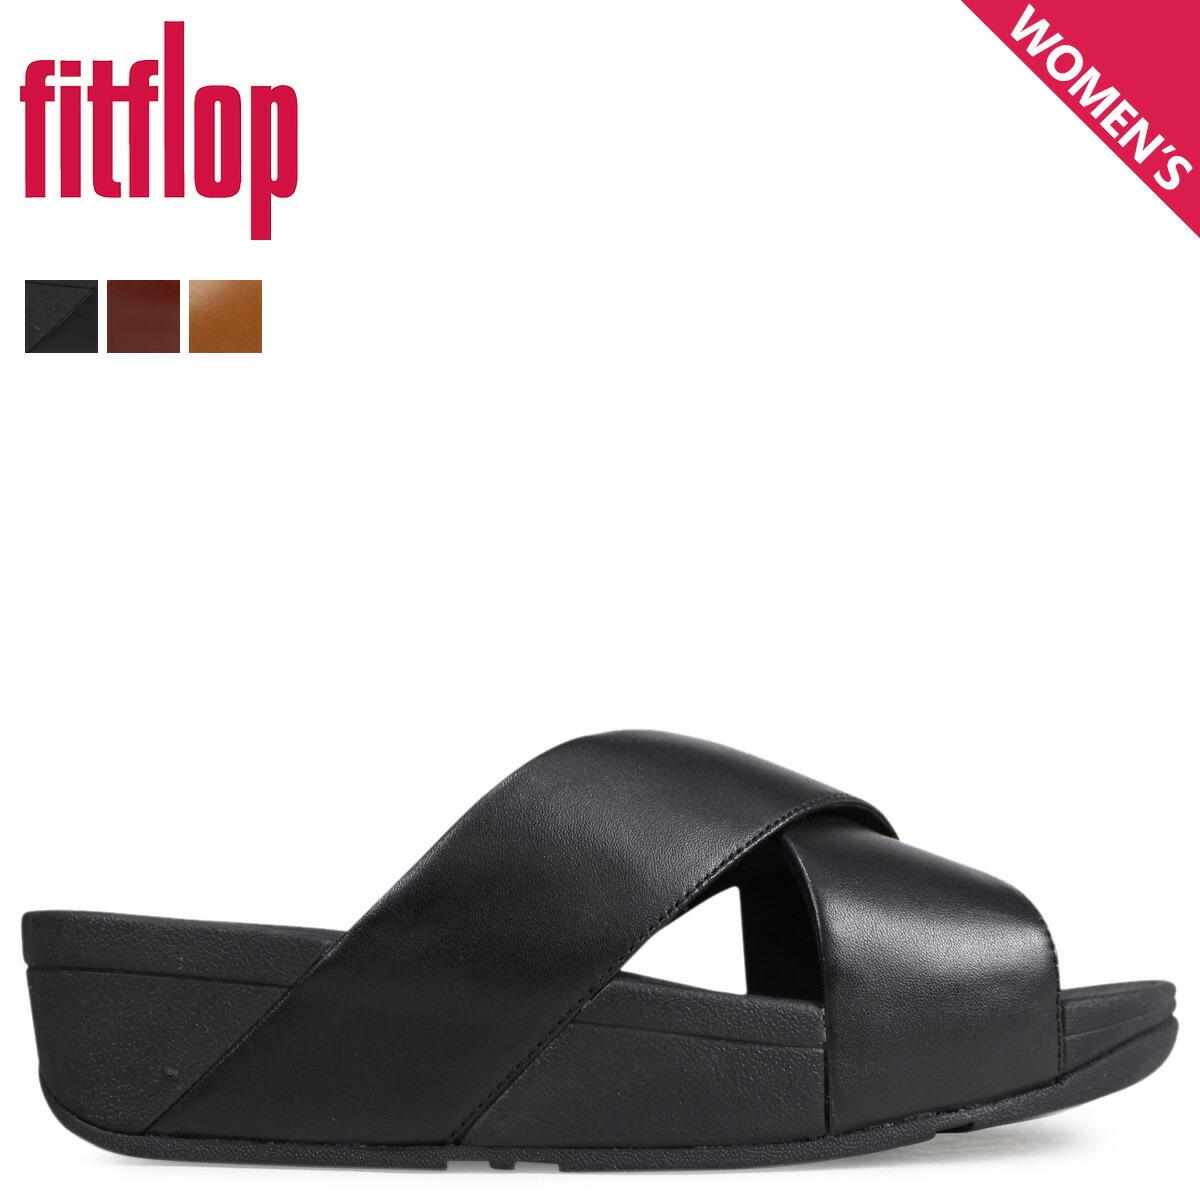 a9ae156a6 Sugar Online Shop  Fitting FLOP sandals FitFlop Lulu LULU CROSS ...